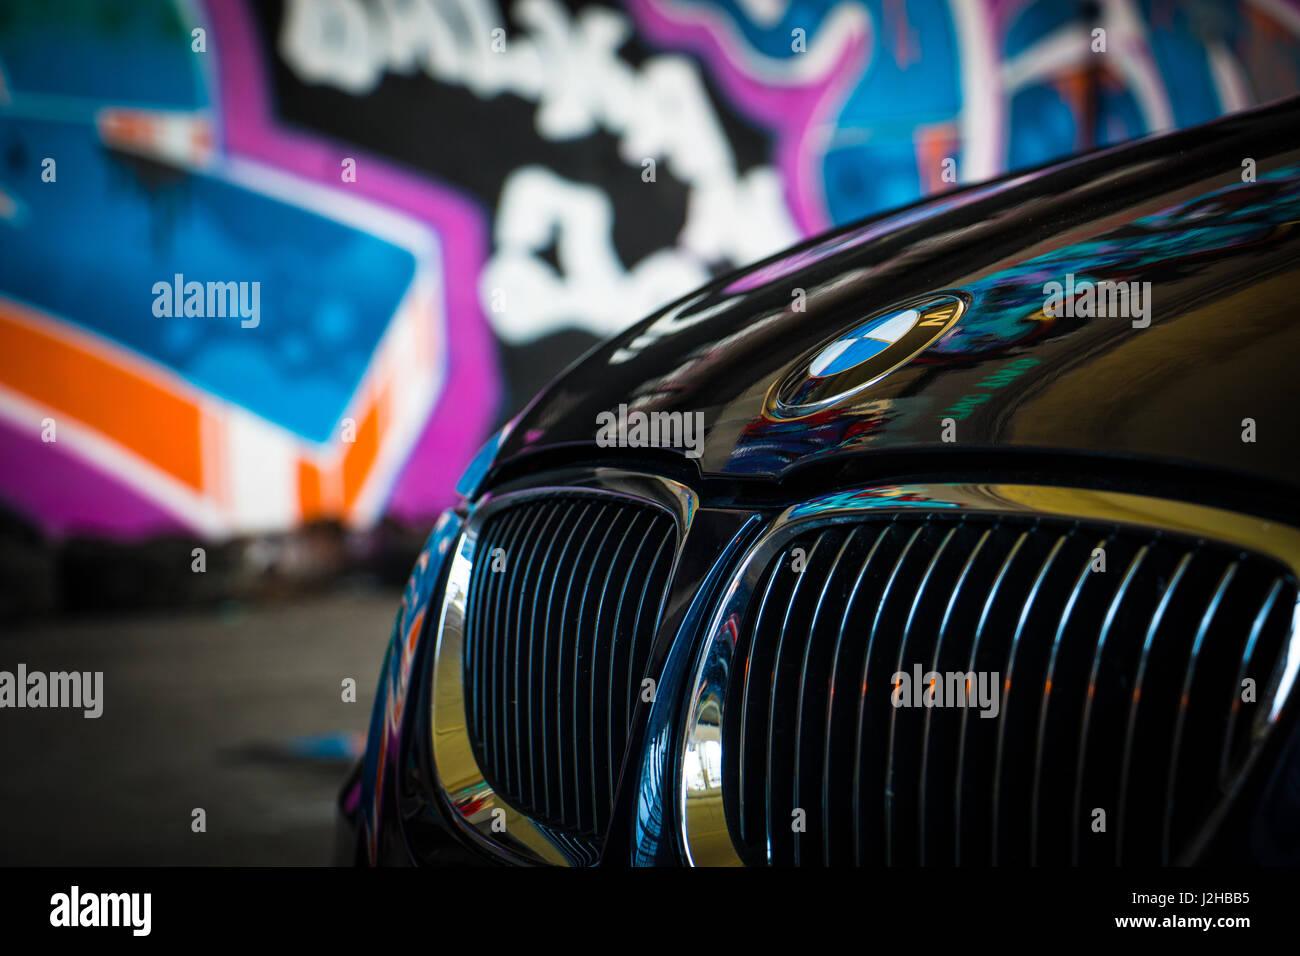 Bmw 3er E92 Wallpaper Hintergrund Full Hd 4k Uhd Monaco Blau